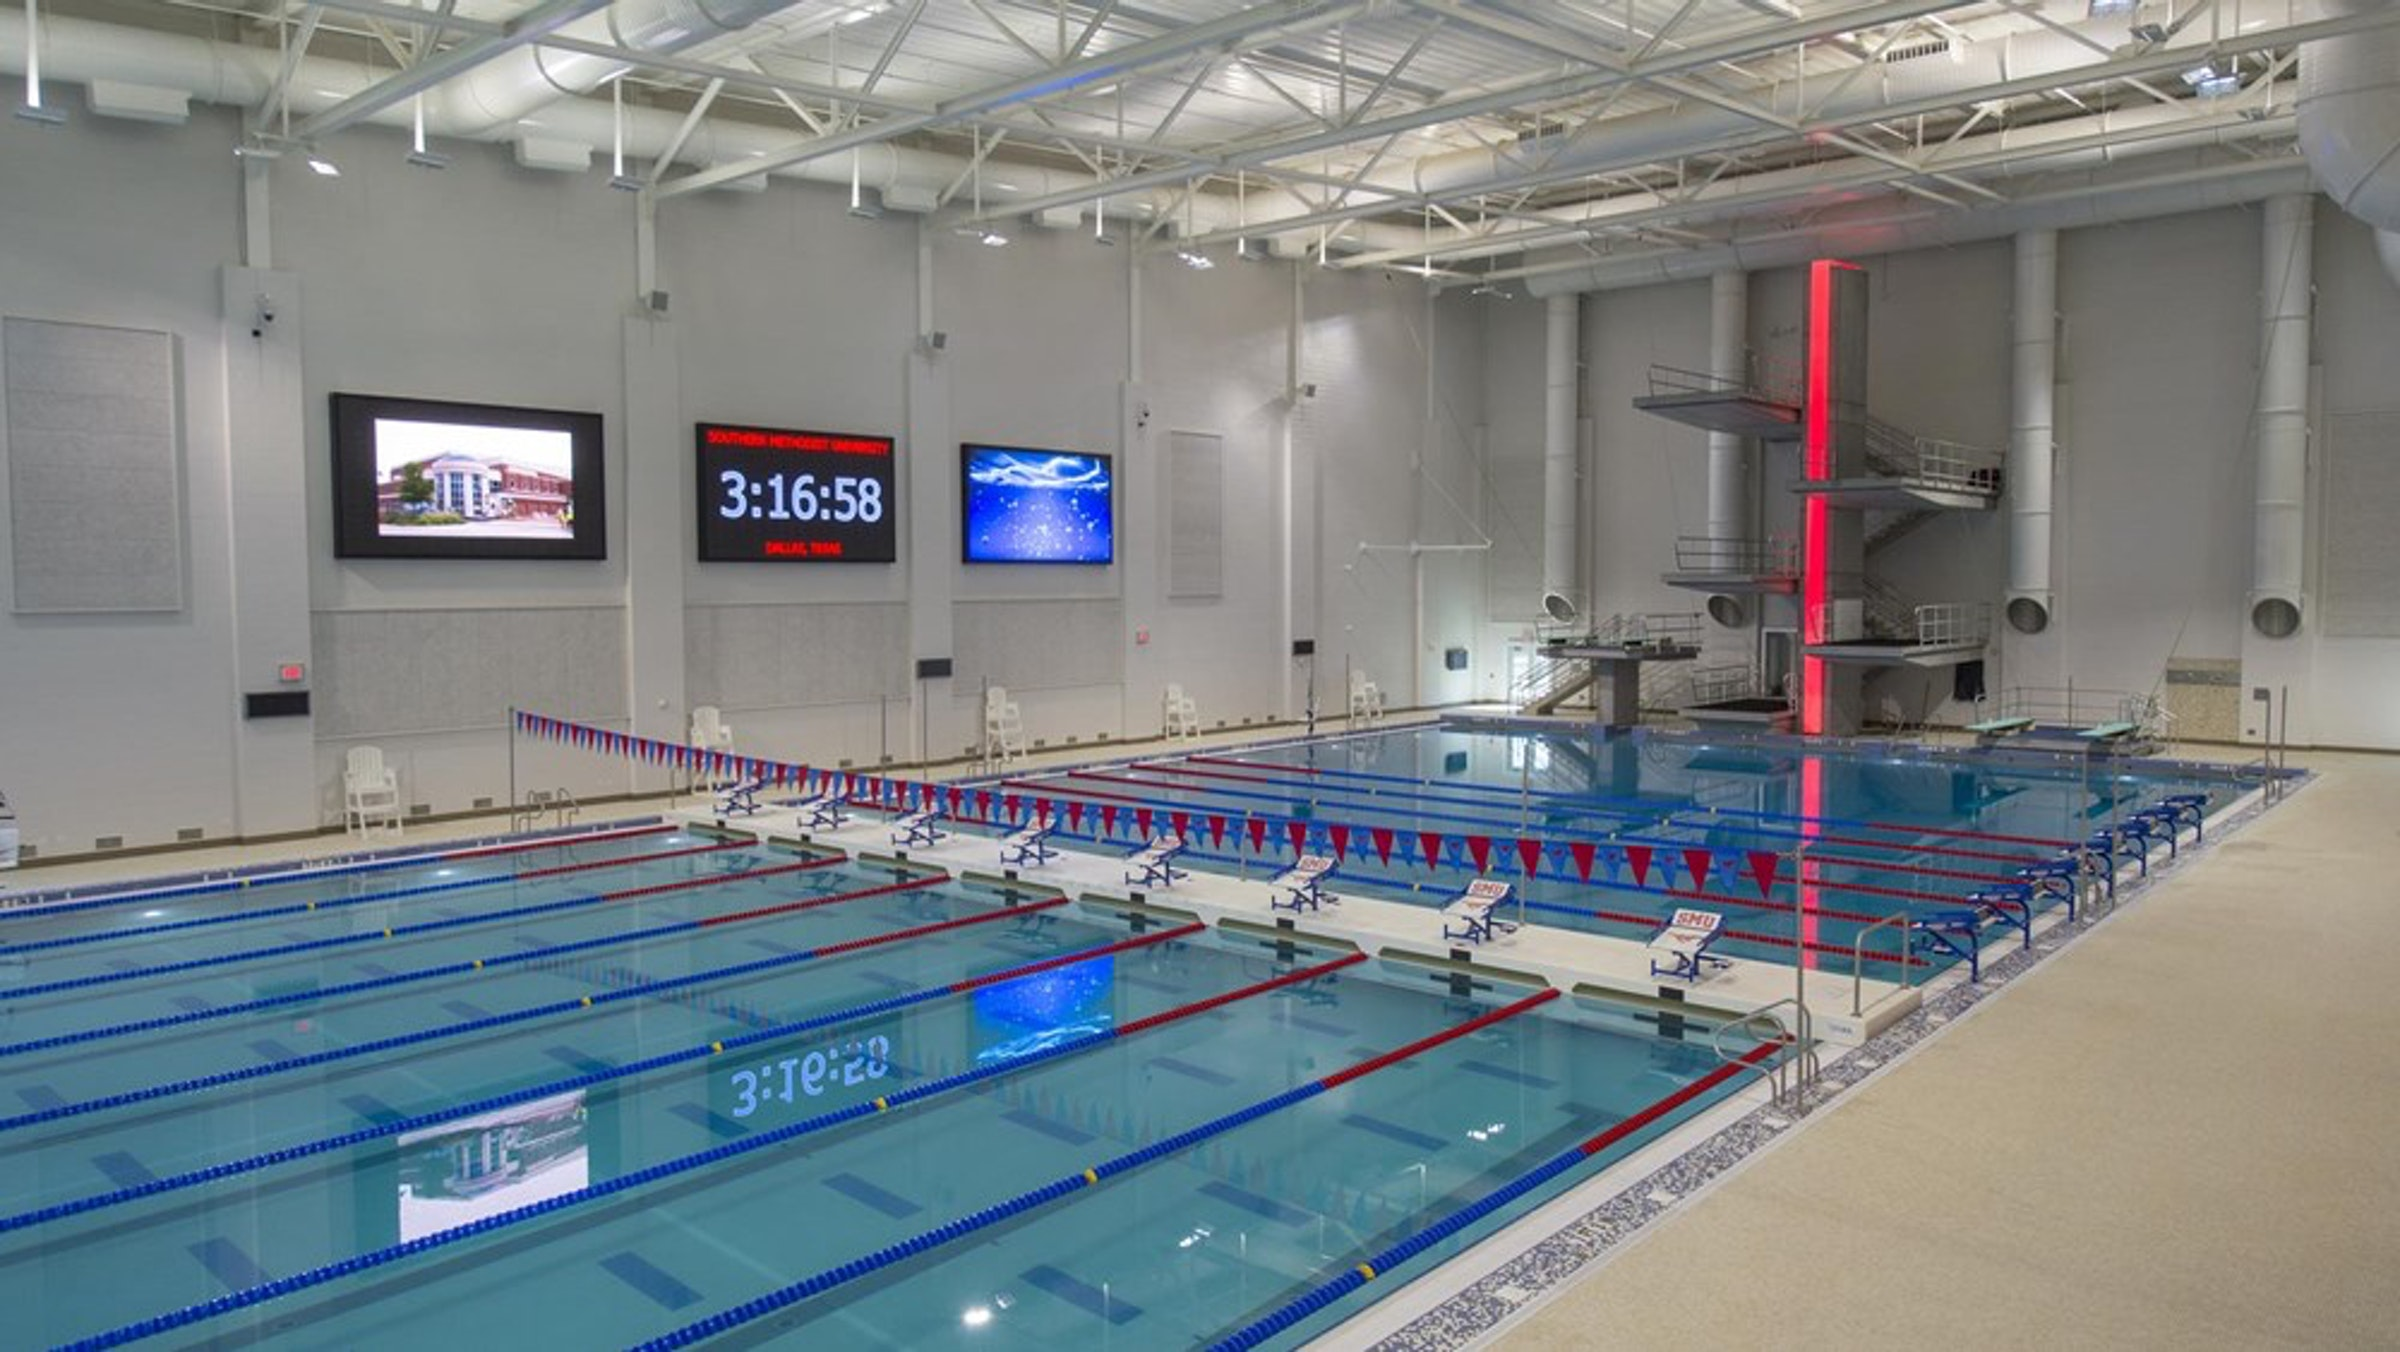 SMU - Robson & Lindley Aquatic Center